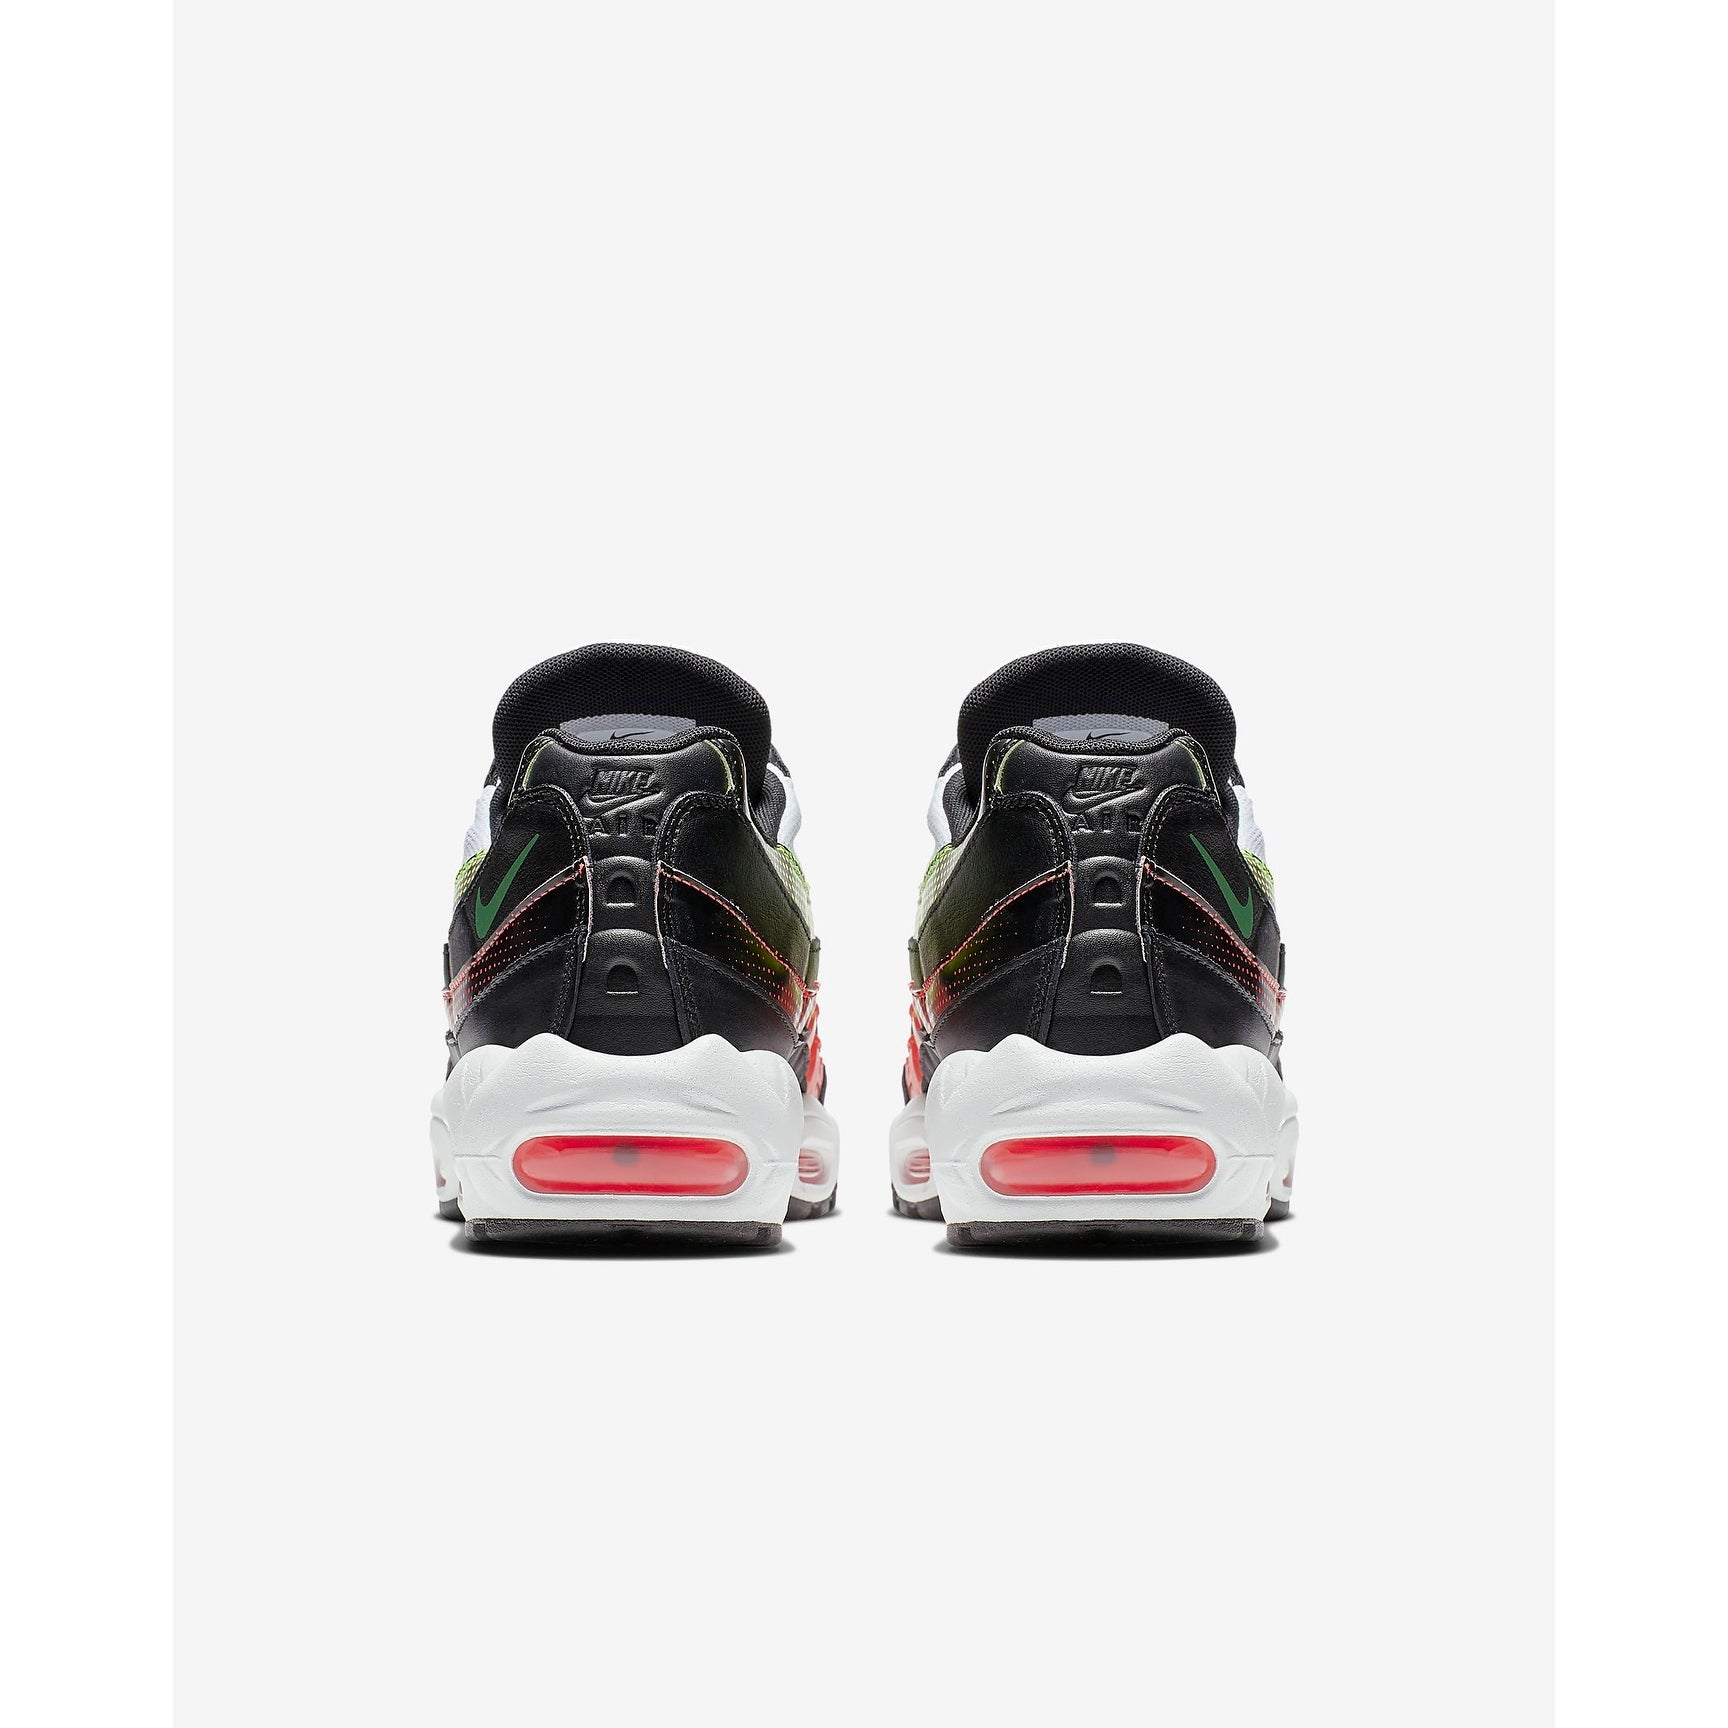 brand new 26cda 2a211 Shop Nike Air Max 95 SE Black Bright Crimson Volt Aloe Verde AJ2018-004 Men  - Free Shipping Today - Overstock - 27995477